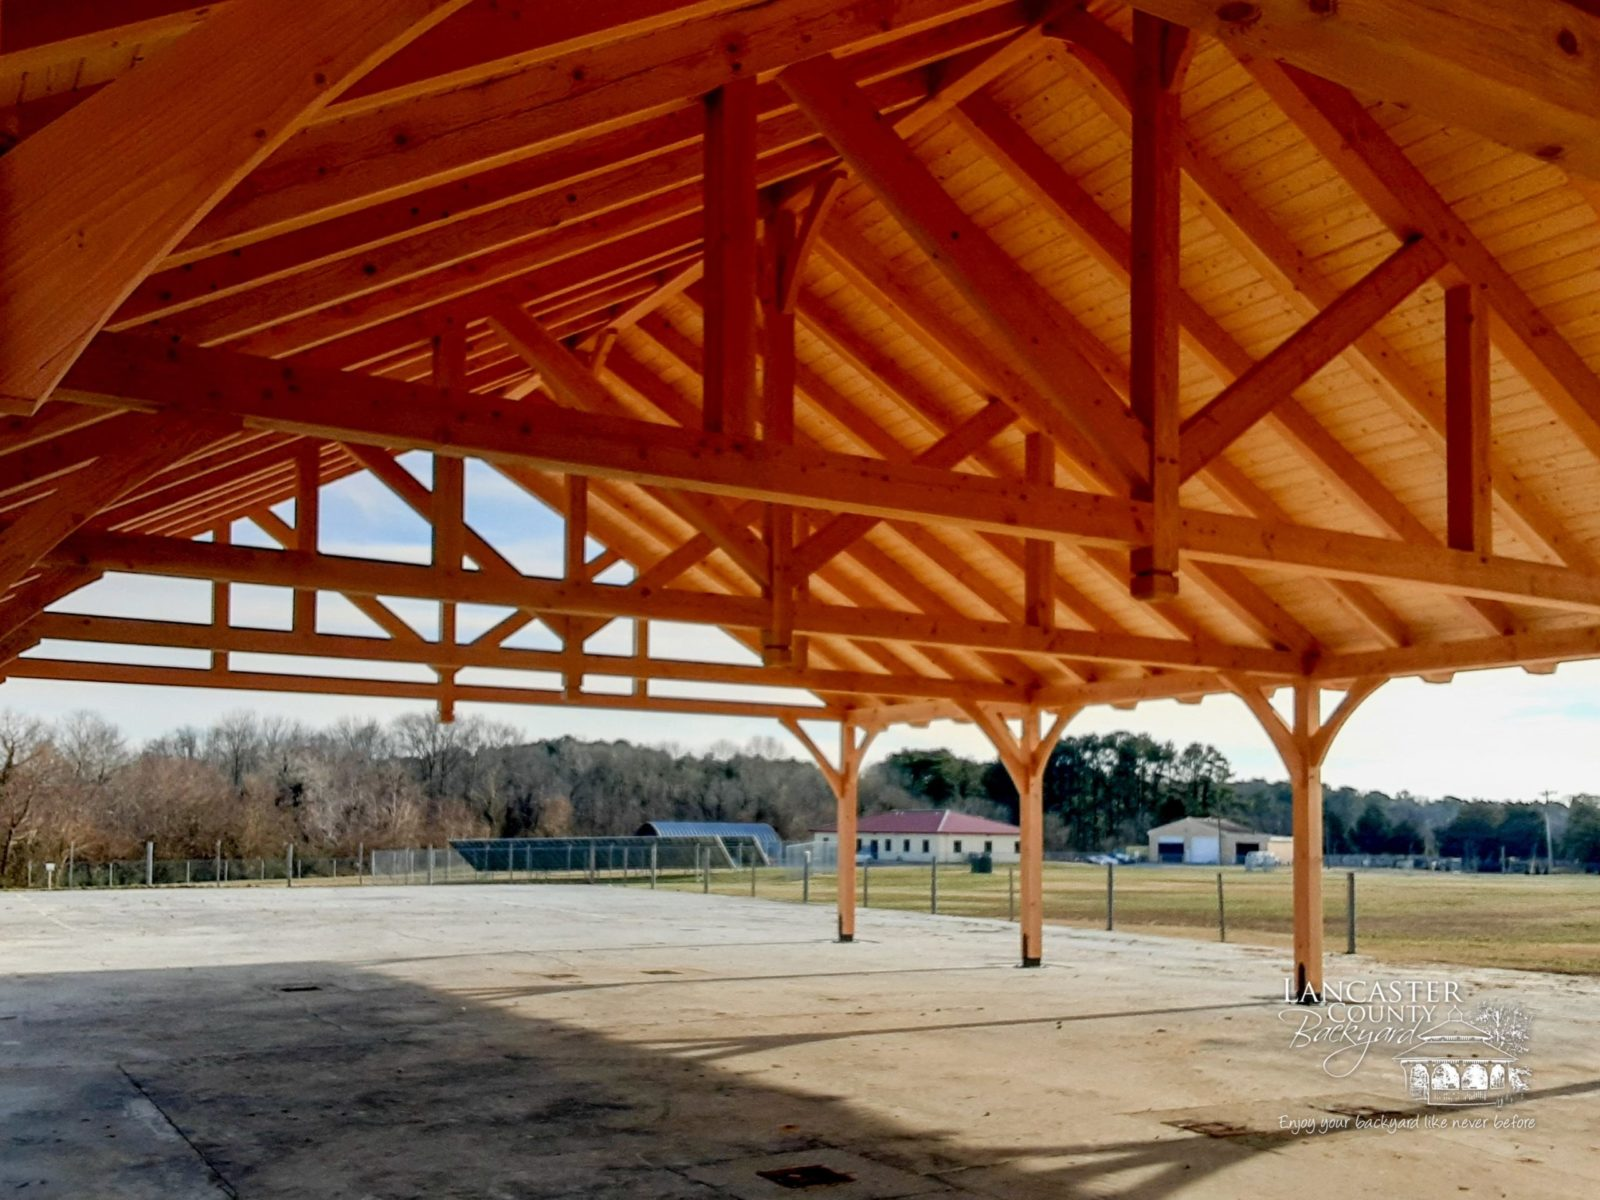 40x80 timber frame pavilion